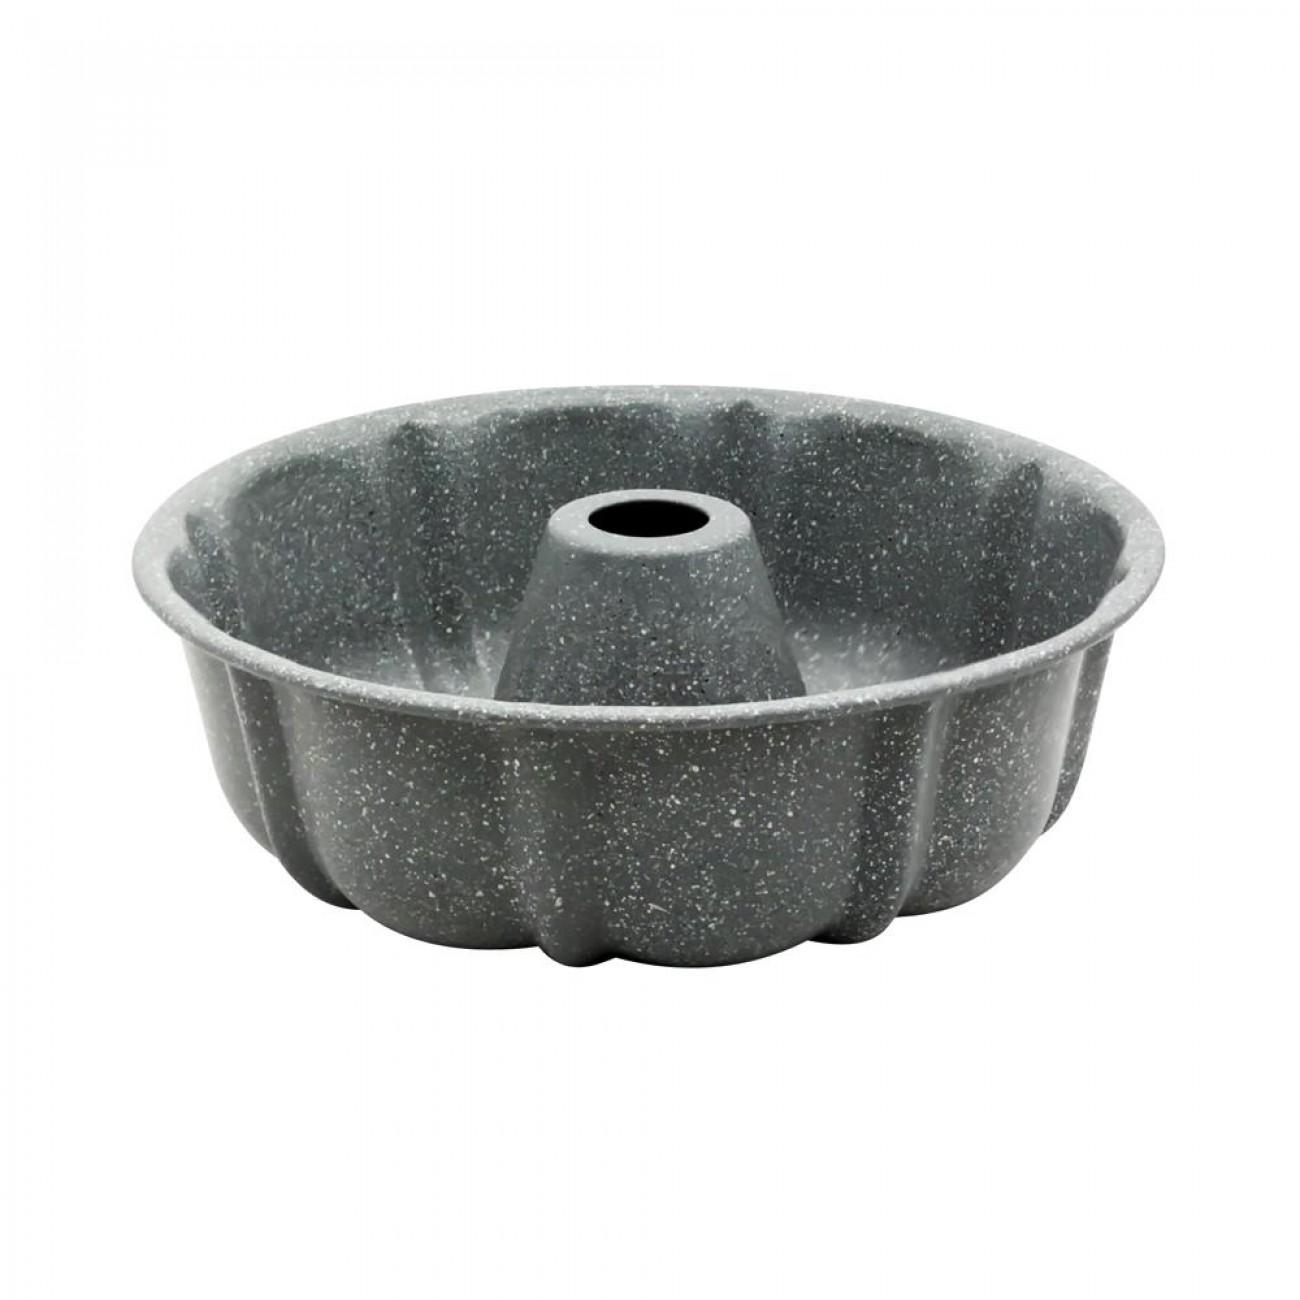 Форма за кекс ZEPHYR ZP 1223 DM, 25.5x8.5 см, Мраморно покритие, Сив в Форми за сладкиши - ZEPHYR | Alleop